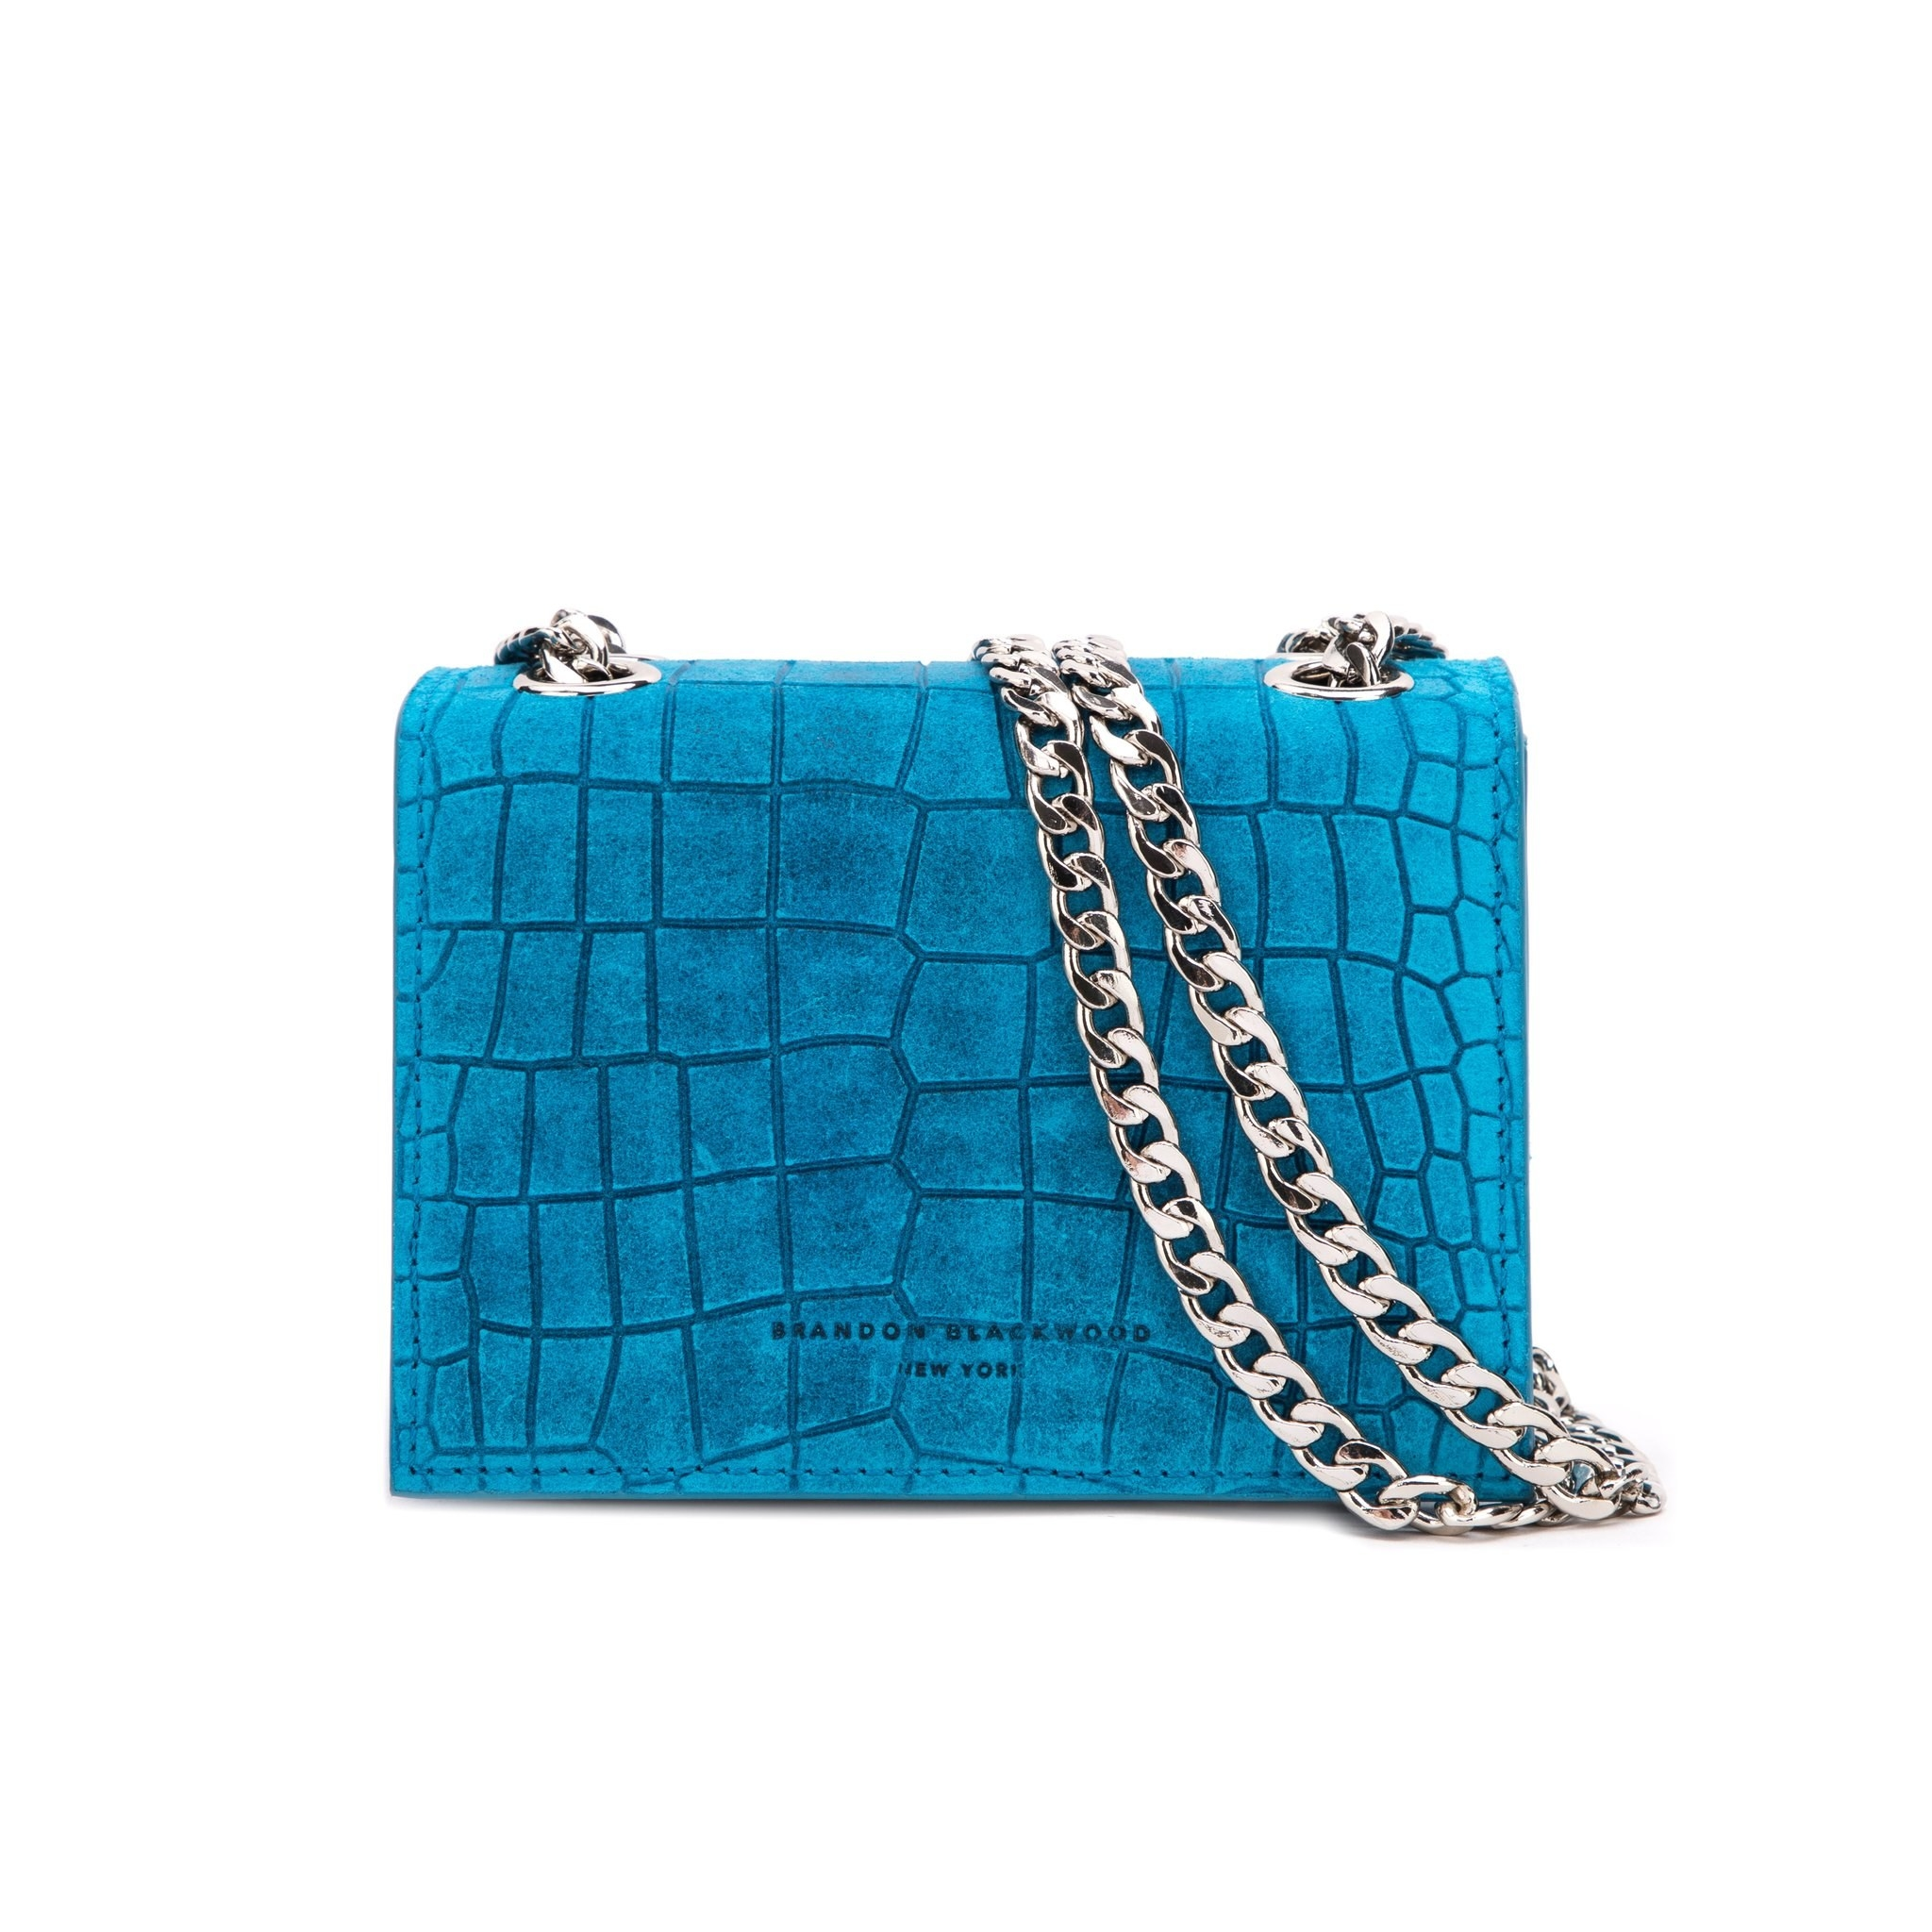 Aqua croc purse on white background